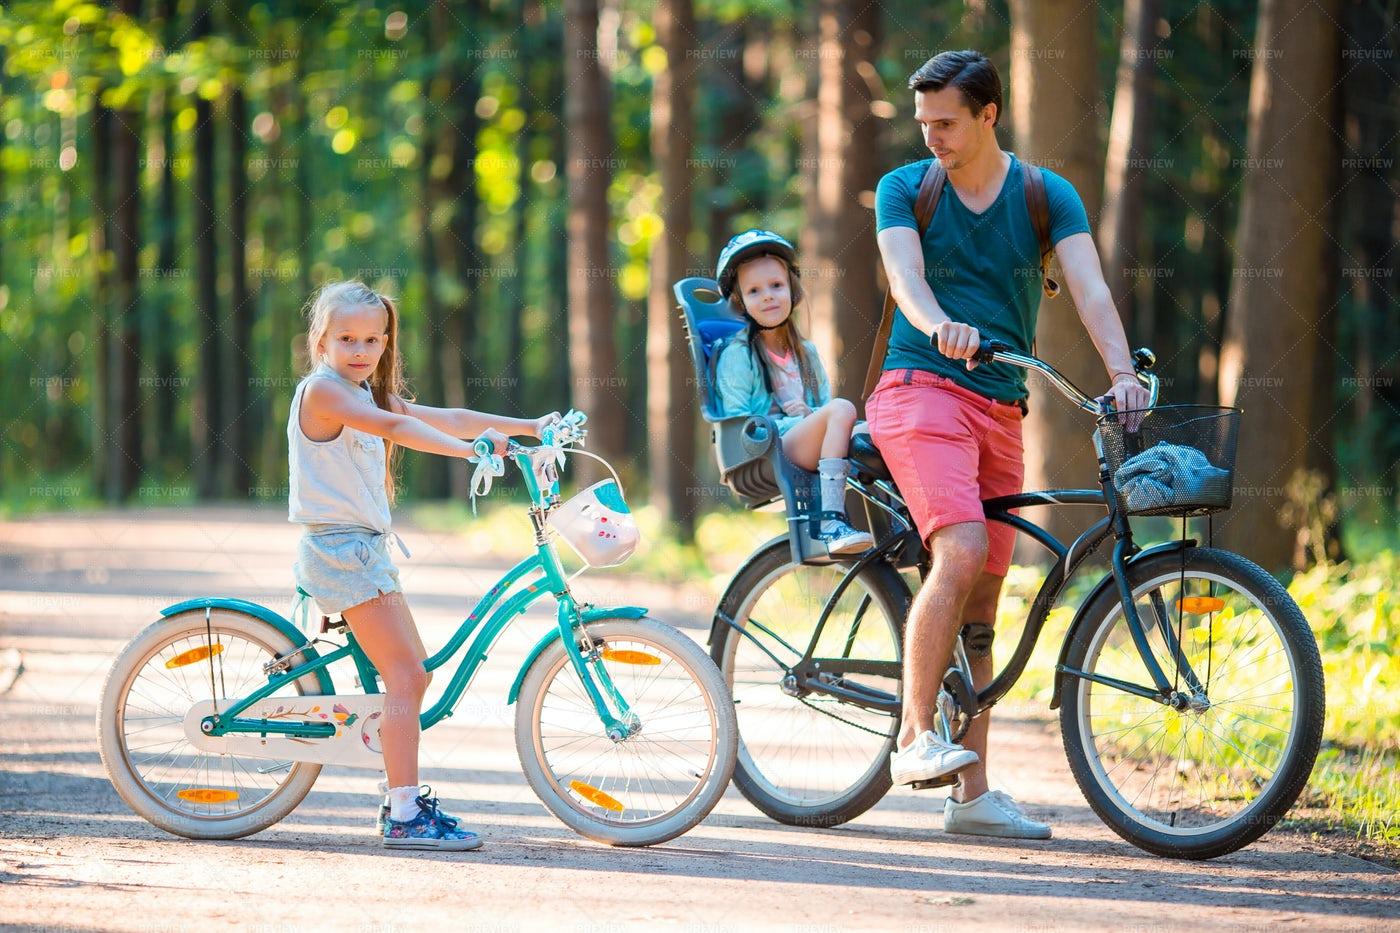 Happy Family Biking: Stock Photos